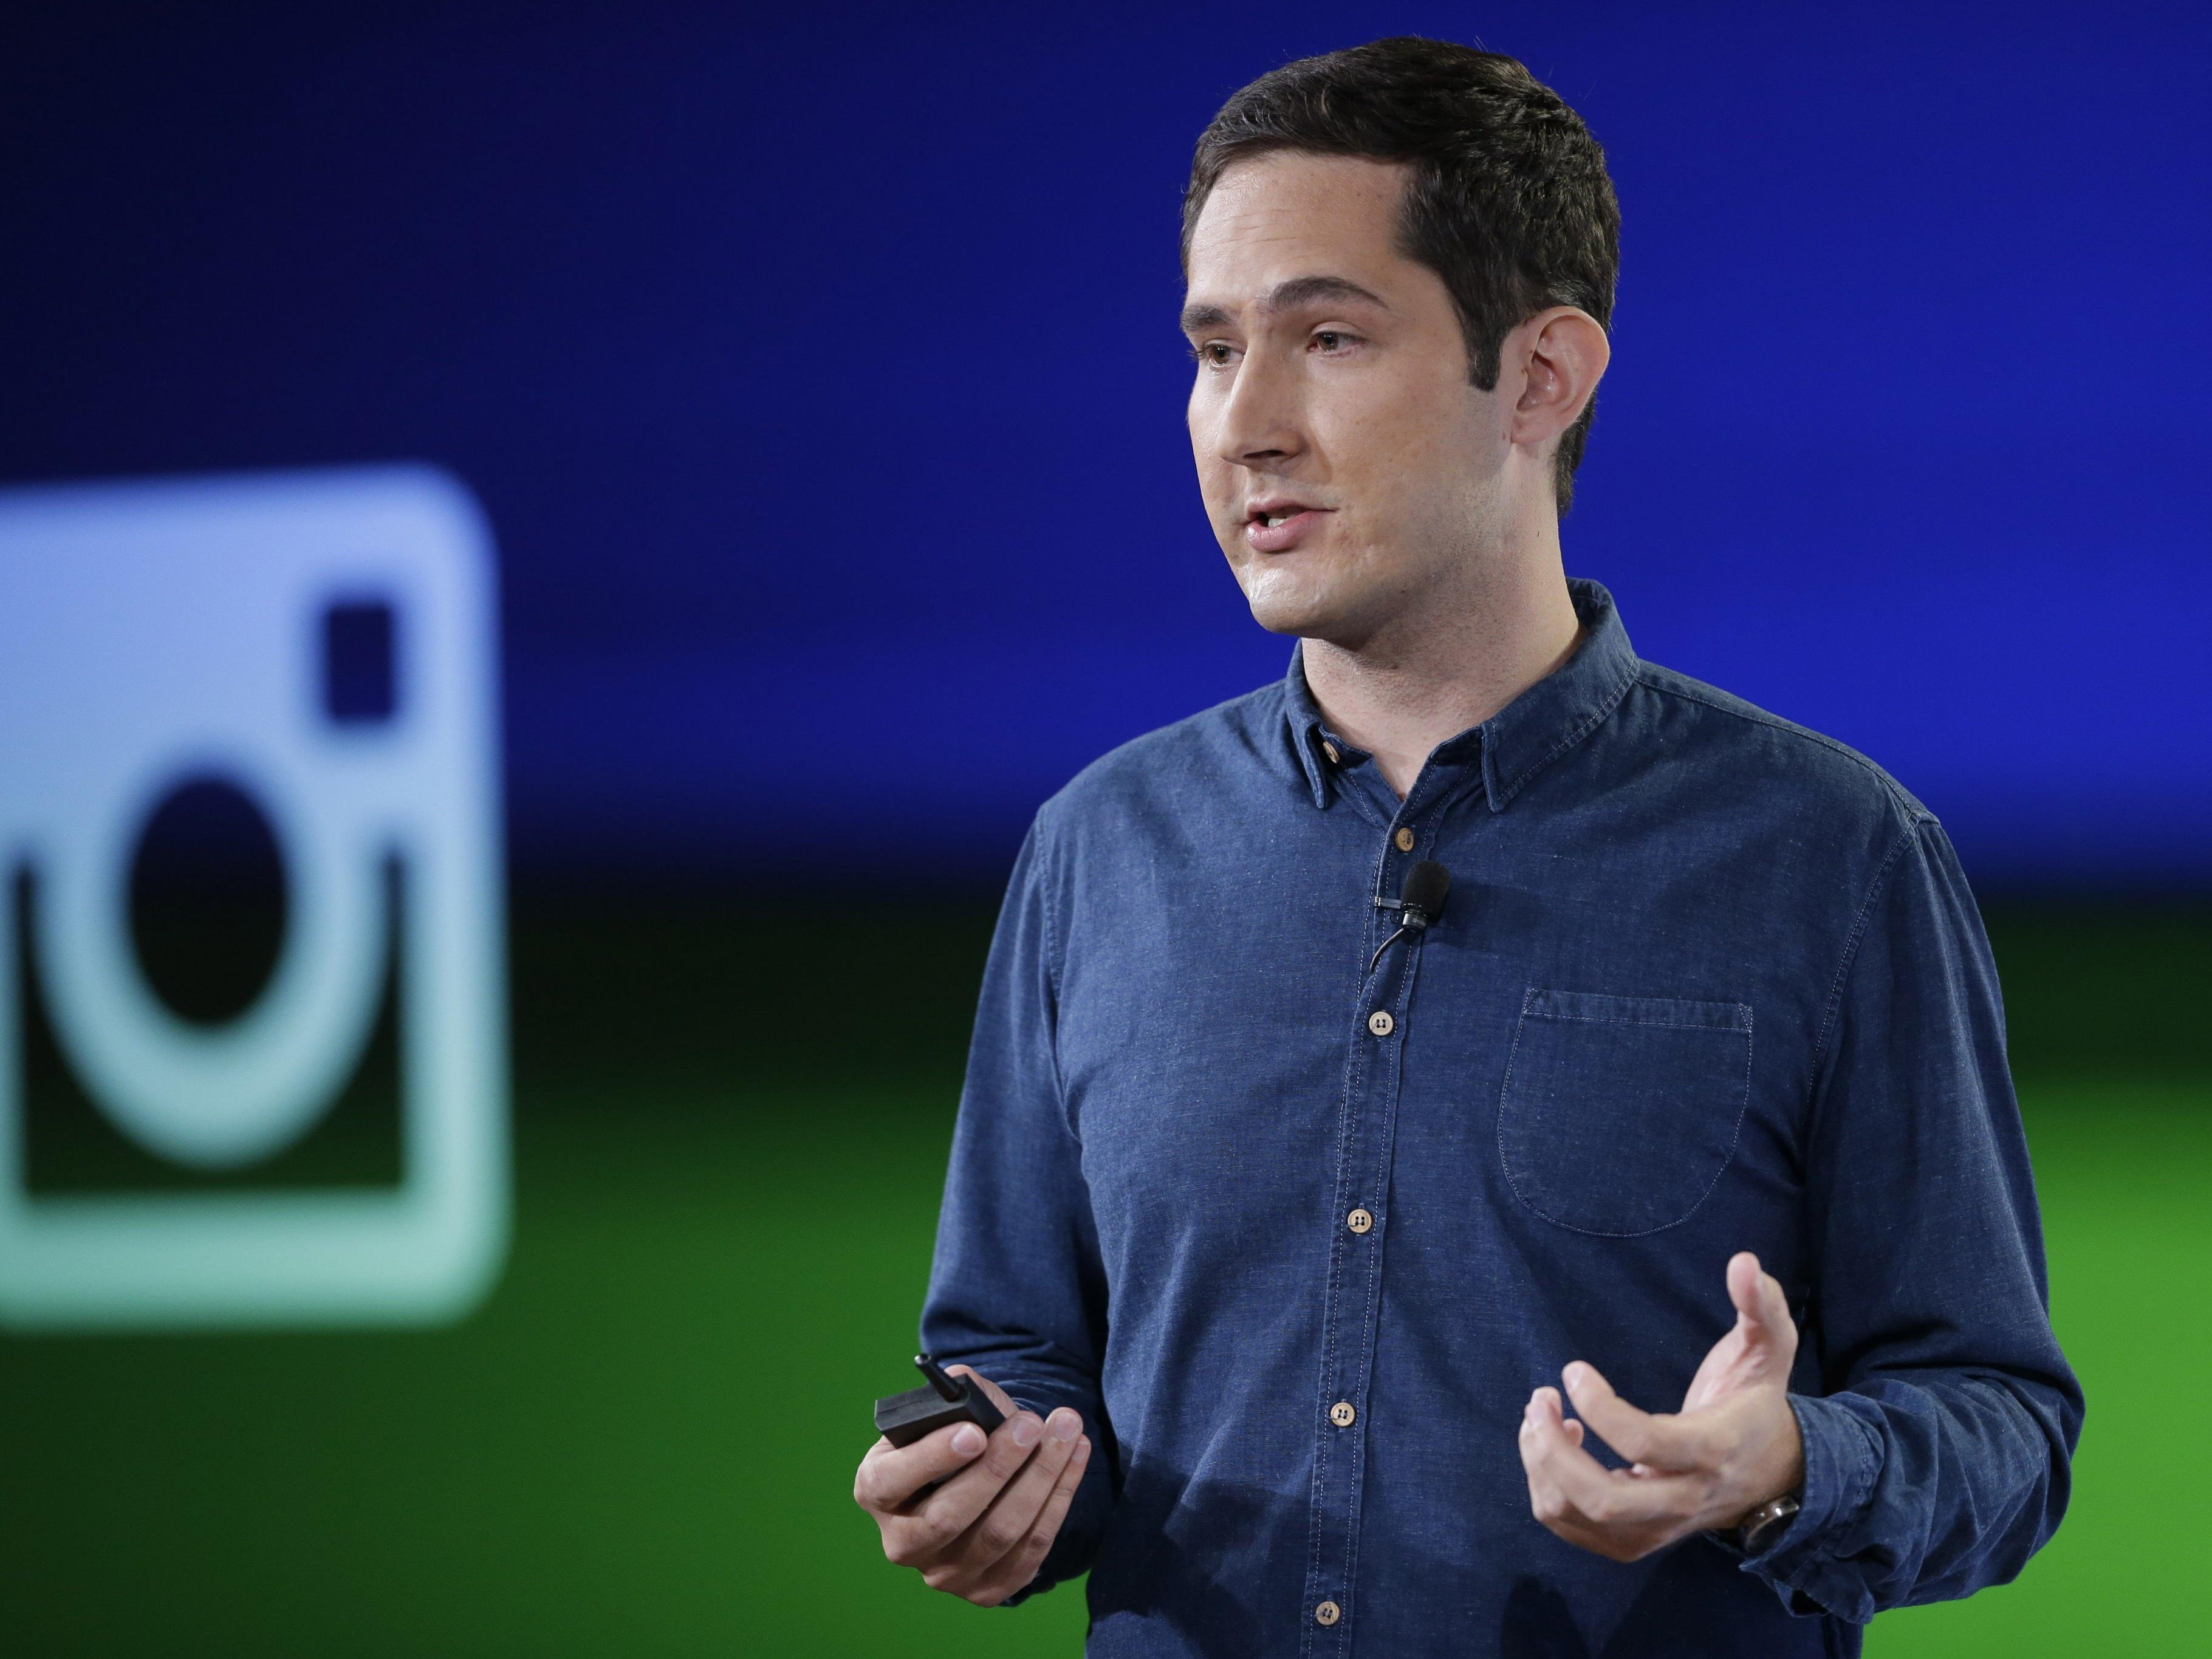 Instagram-Chef Kevin Systrom bedankte sich bei Snapchat.